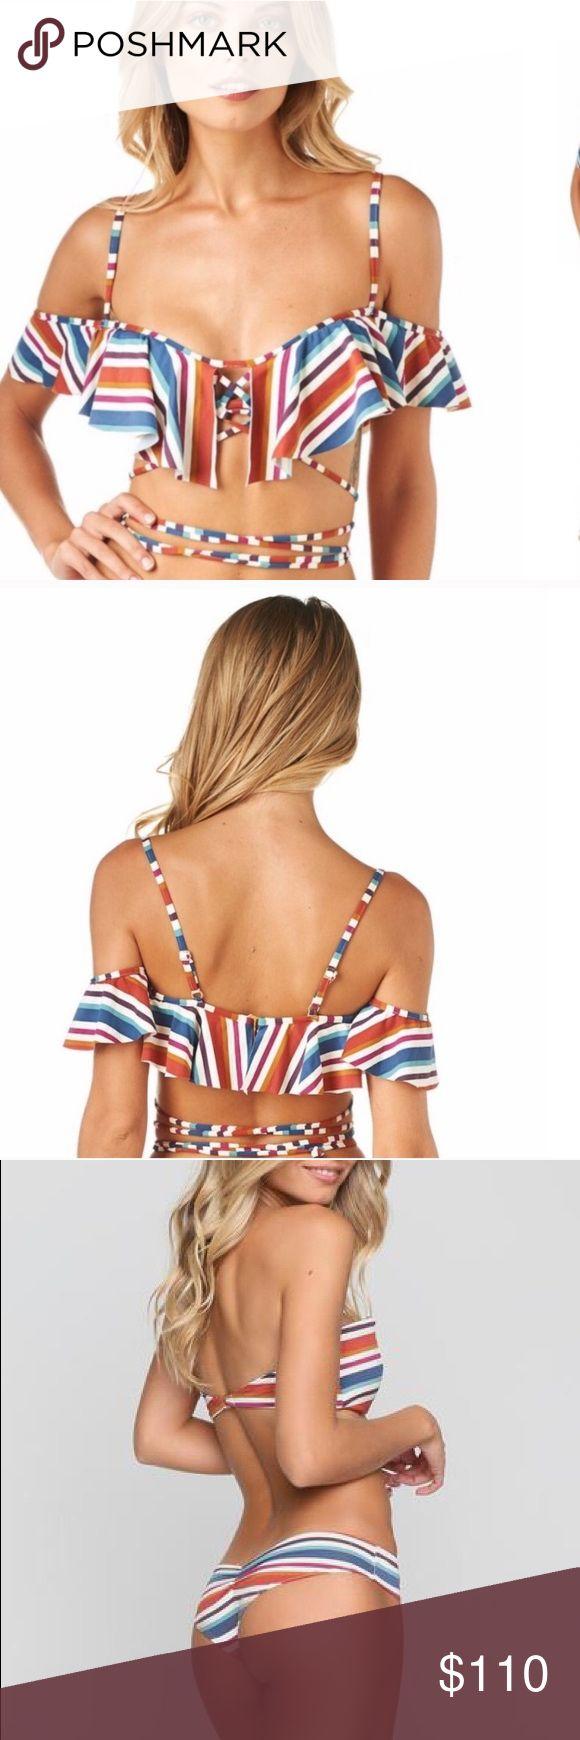 Montce 70's Stripe La Calletta Nu Micro Bikini Set Montce 70's Stripe La Cal…